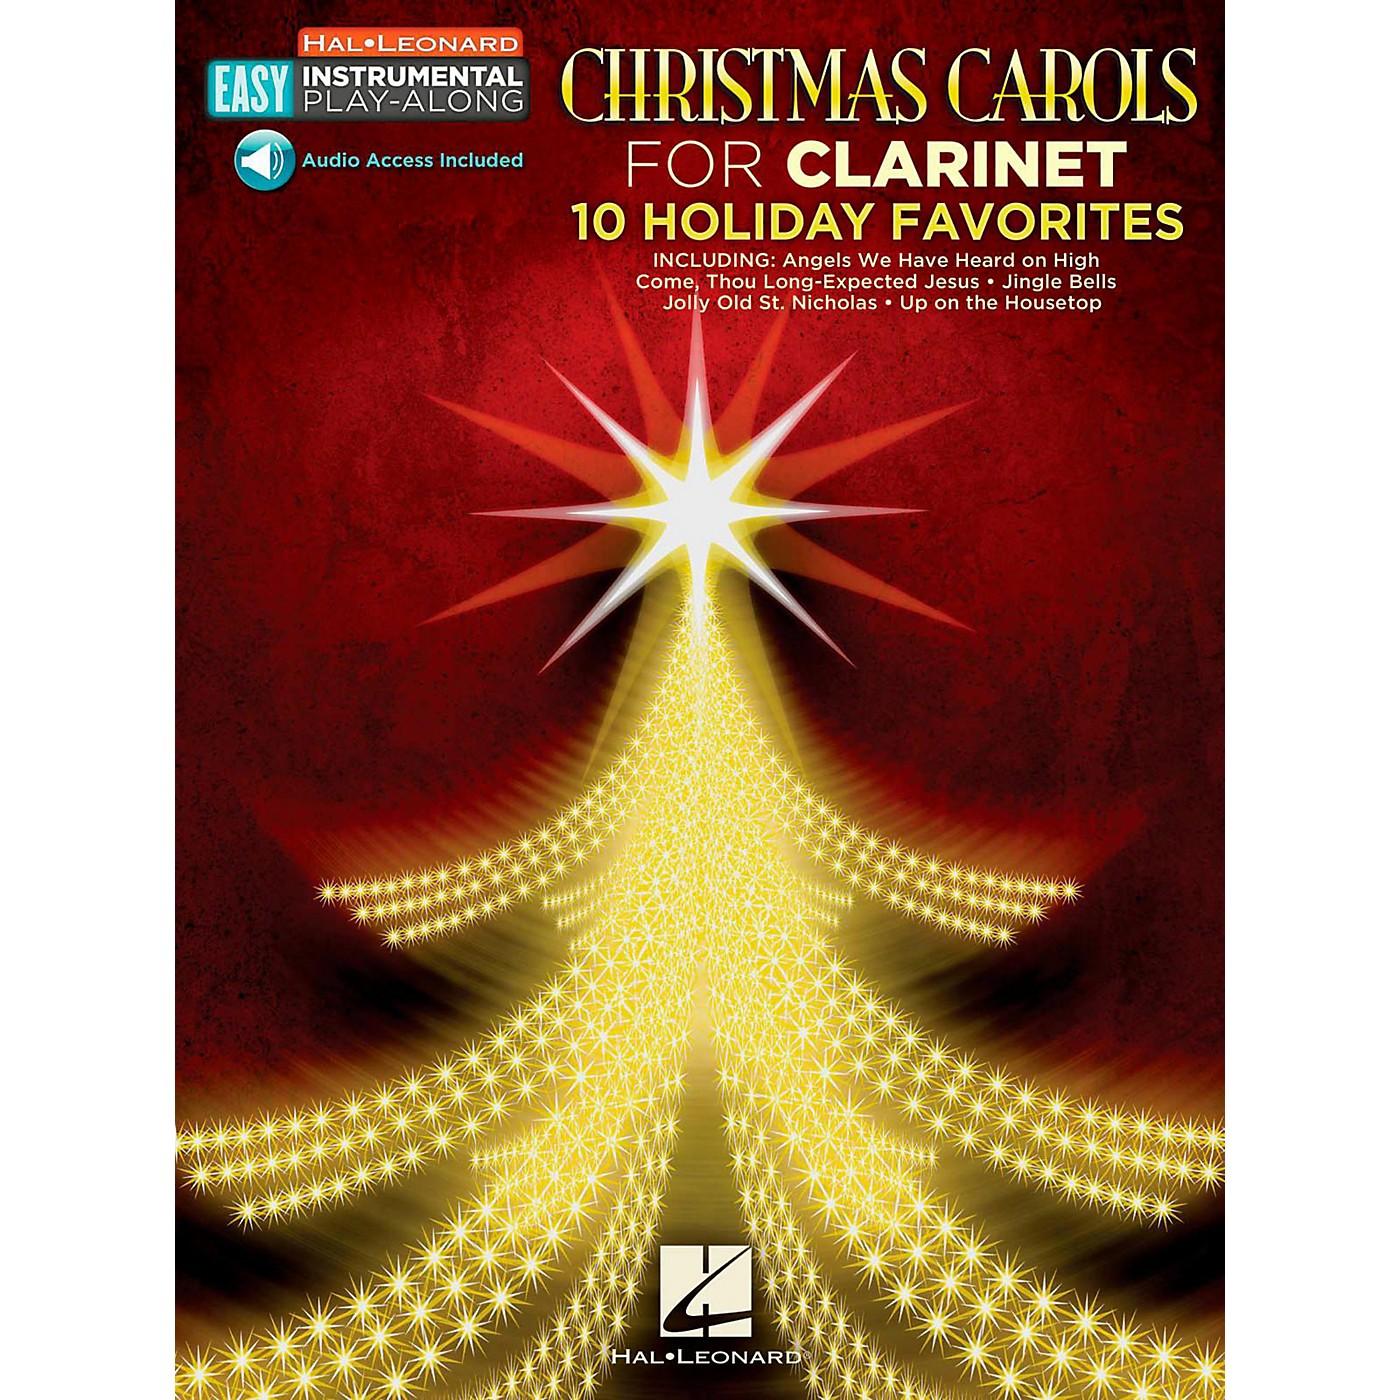 Hal Leonard Christmas Carols - Clarinet - Easy Instrumental Play-Along (Audio Online) thumbnail